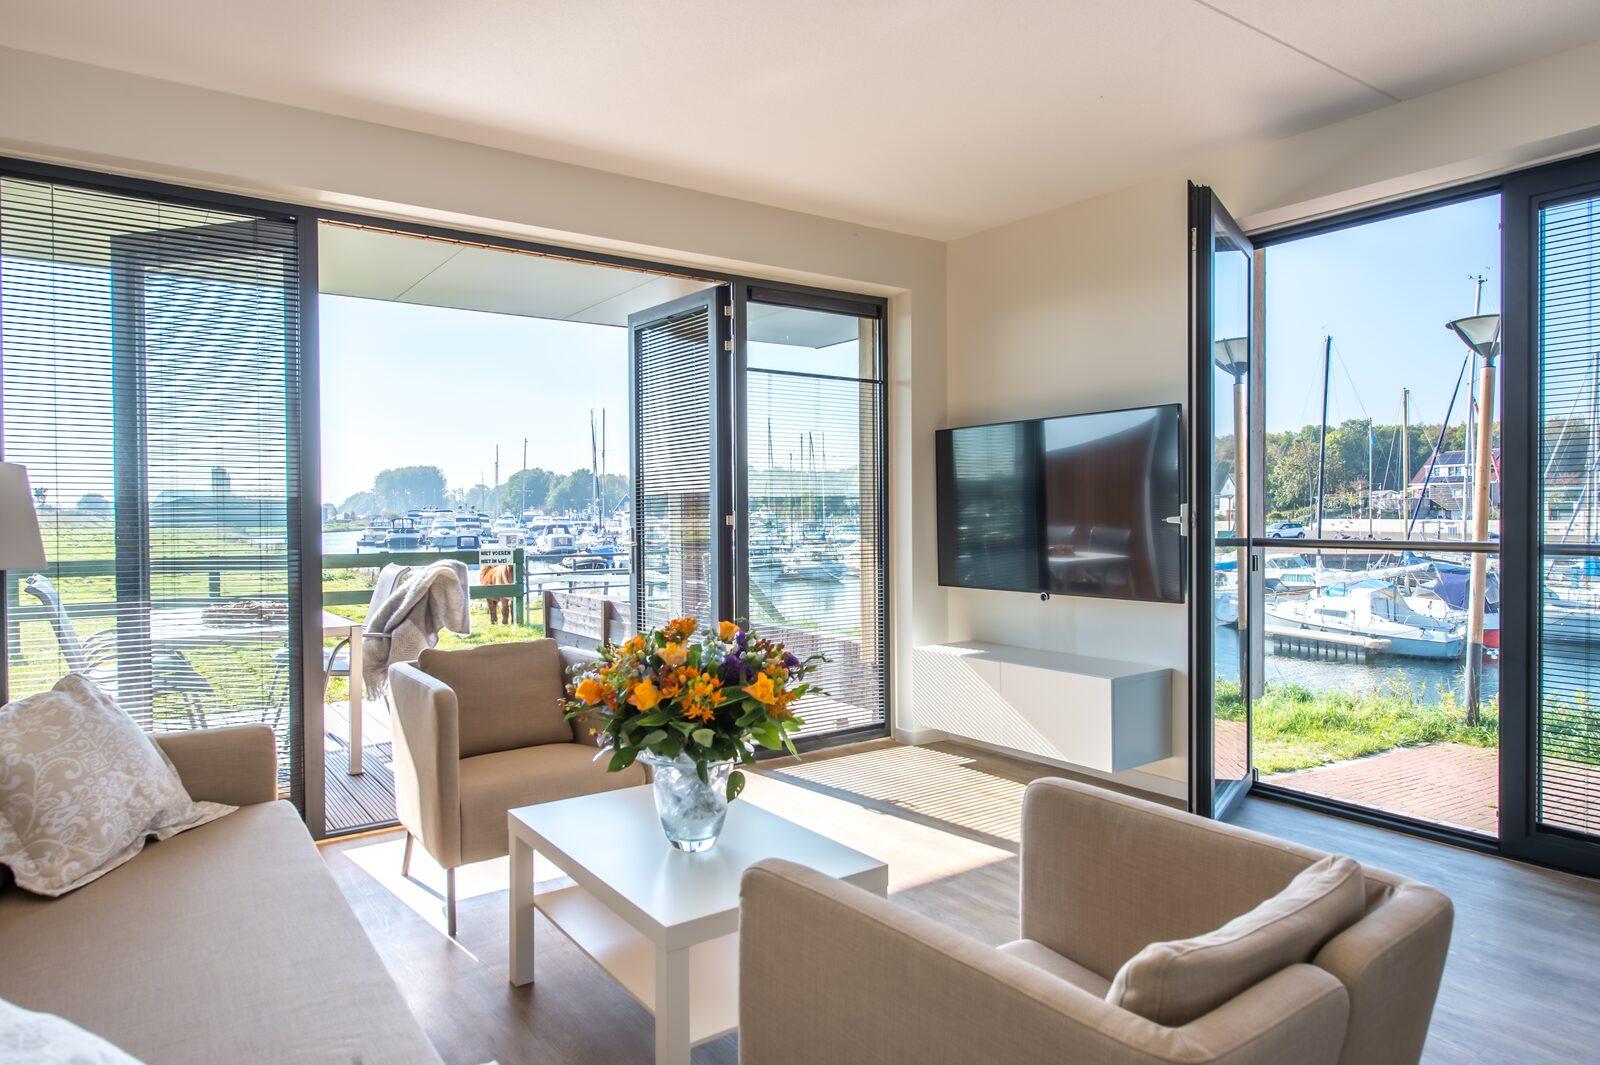 Luxurious apartments in Zeeland along the Veerse Meer